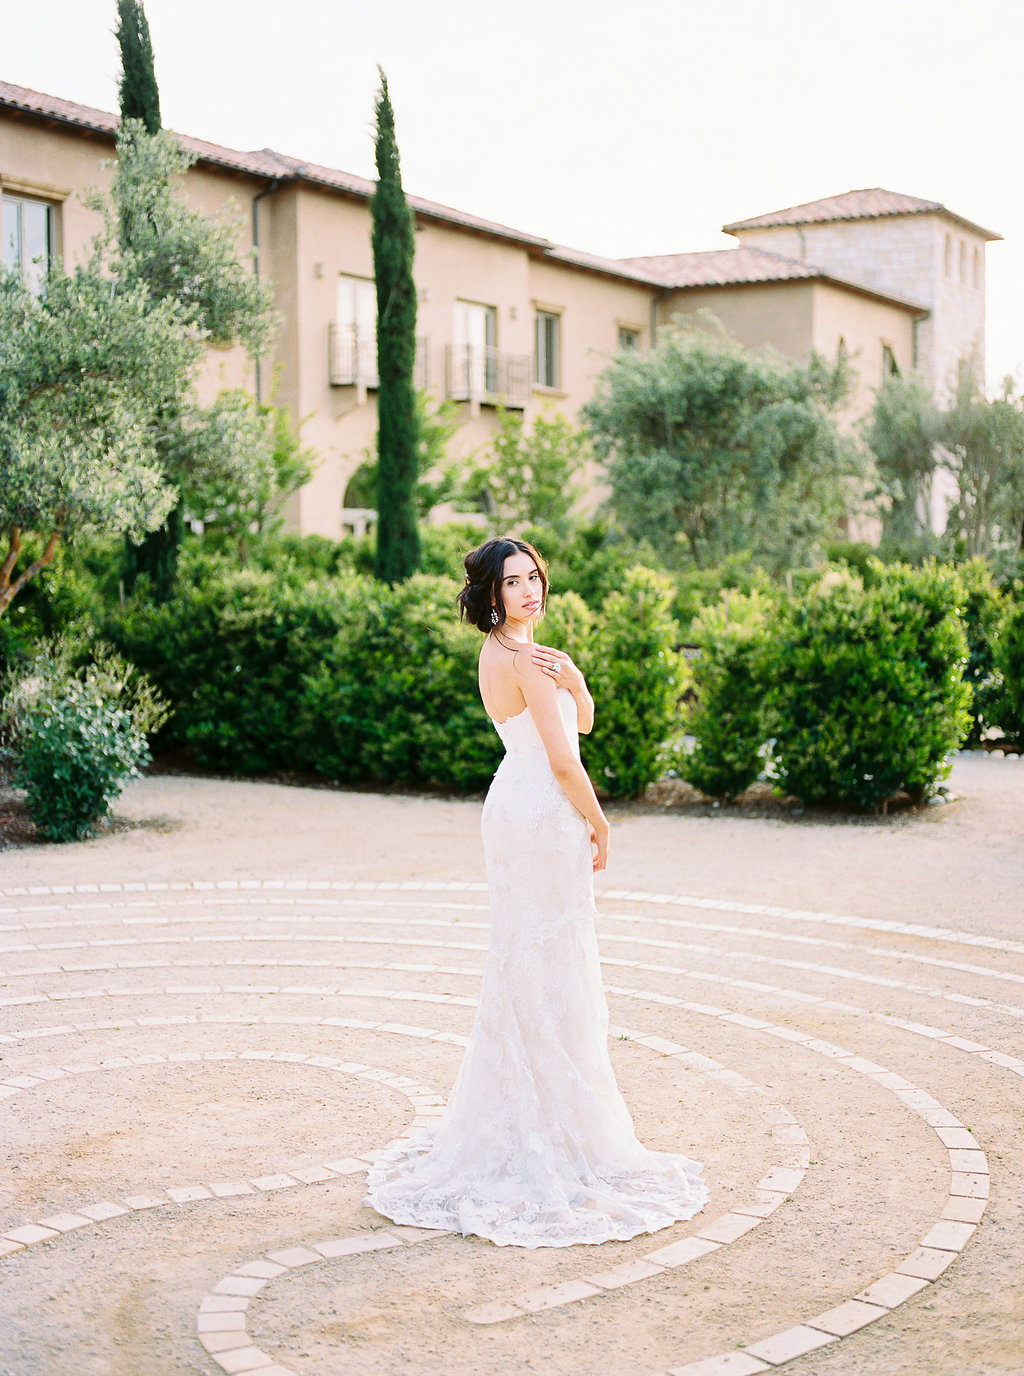 Paso Robles California - Allegretto Resort and Vineyards - Bridal Session - fine art film photographer Tanja Kibogo20.JPG